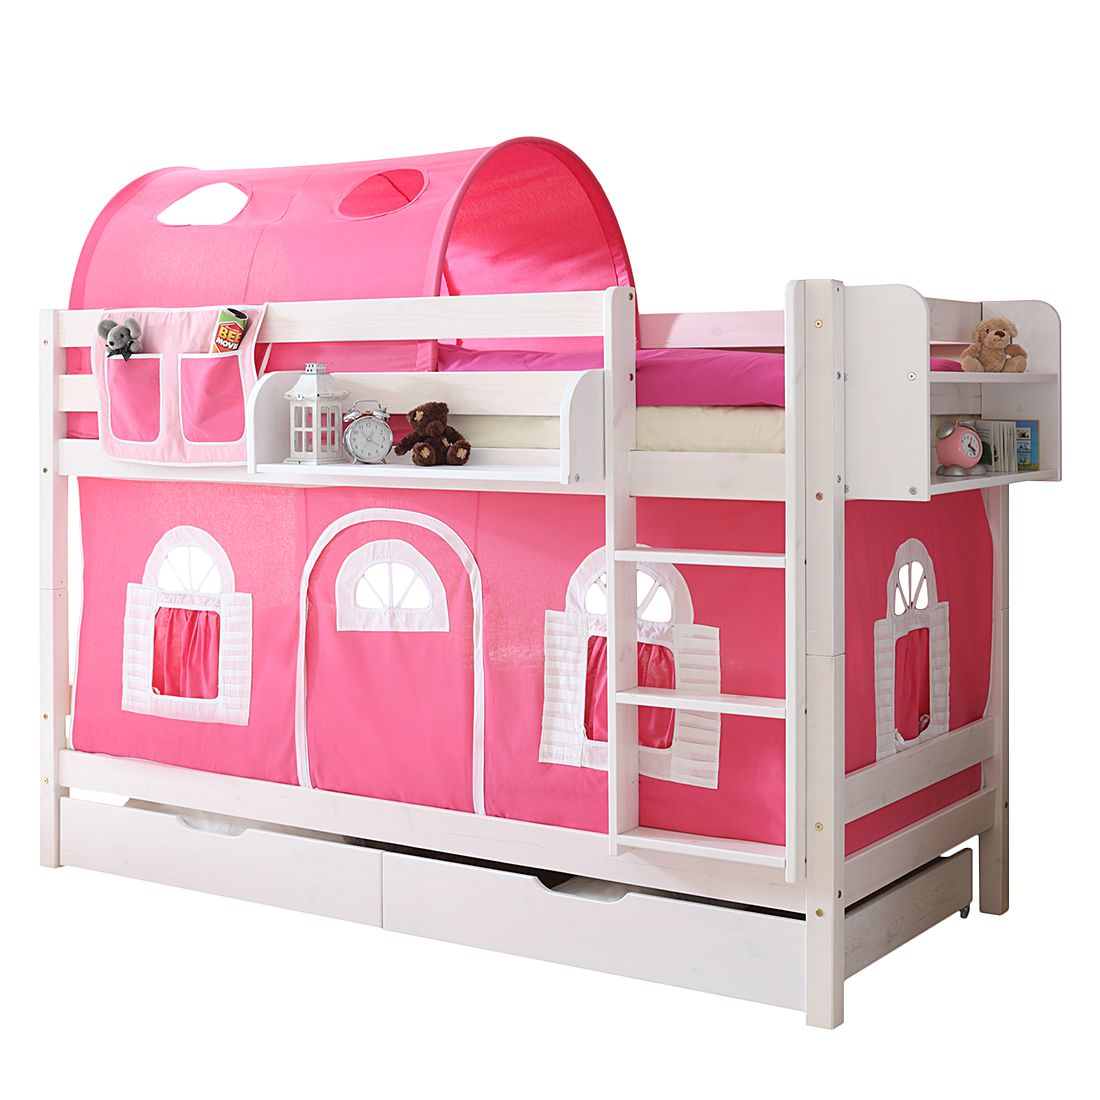 home24 Etagenbett Marcel II | Kinderzimmer > Kinderbetten | Pink | Massivholz | Ticaa